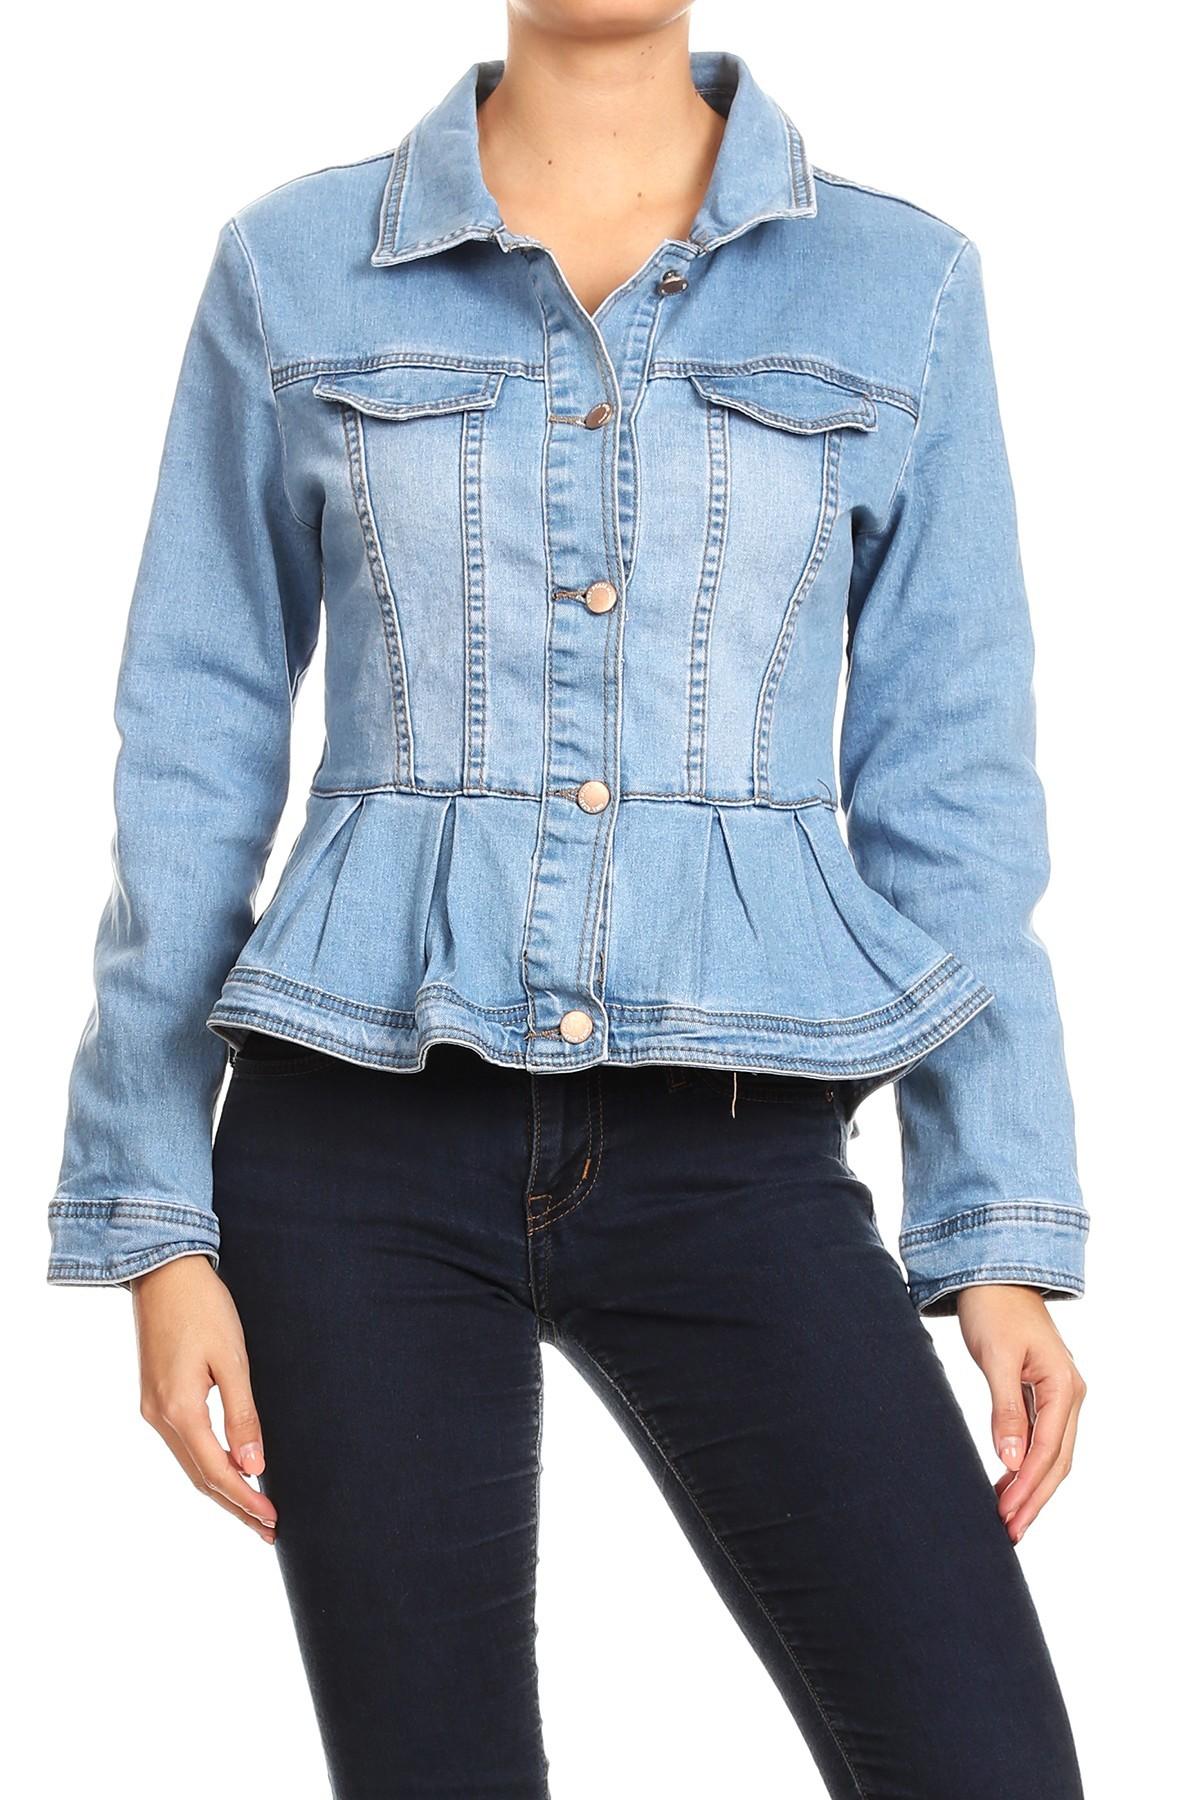 Women-039-s-Juniors-Premium-Denim-Peplum-Bodice-Long-Sleeve-Jacket thumbnail 14